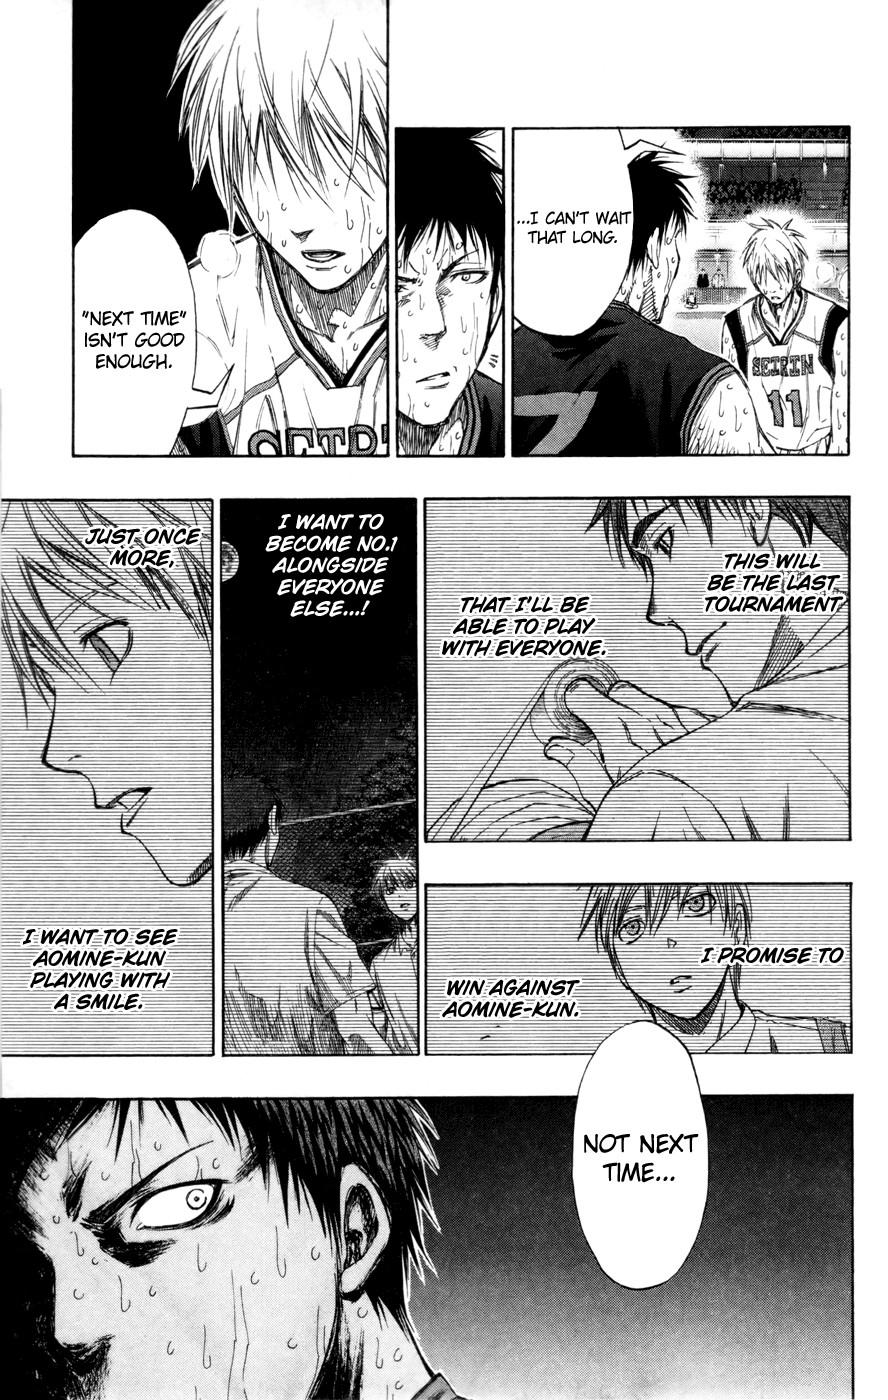 Kuroko no Basket Manga Chapter 128 - Image 11